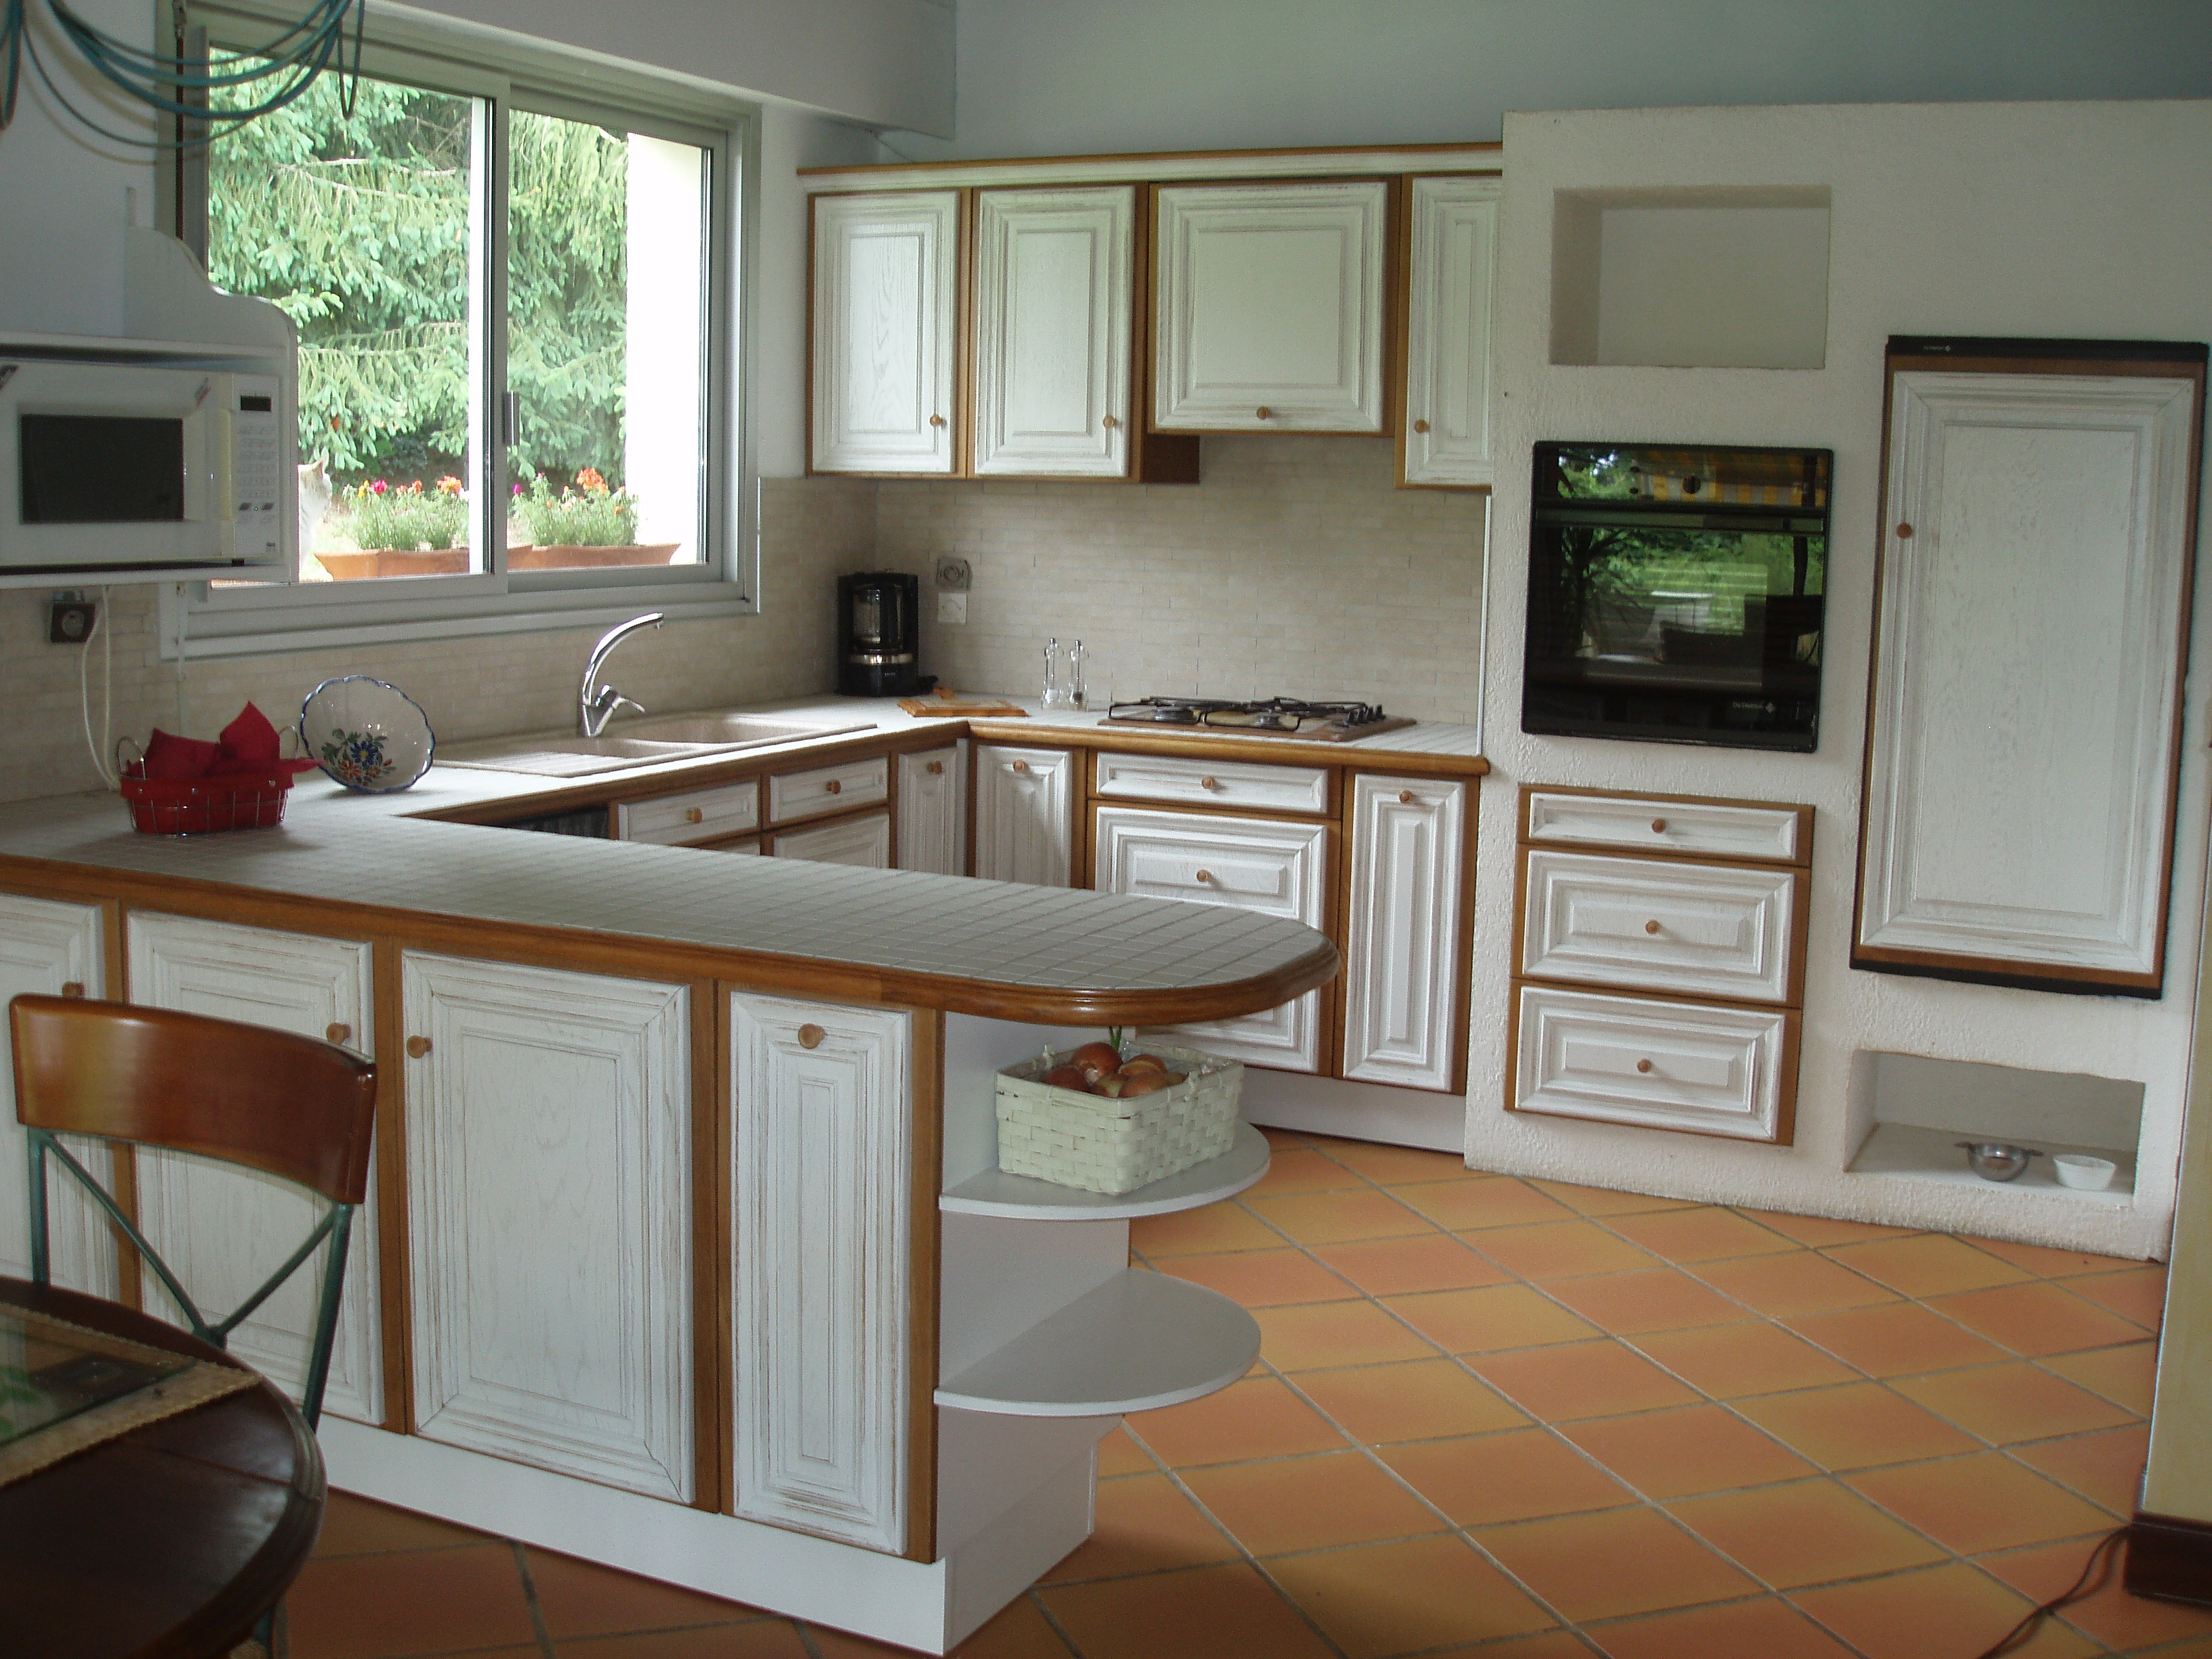 cuisine chêne laqué blanc cérusé vieilli/cadre chêne clair